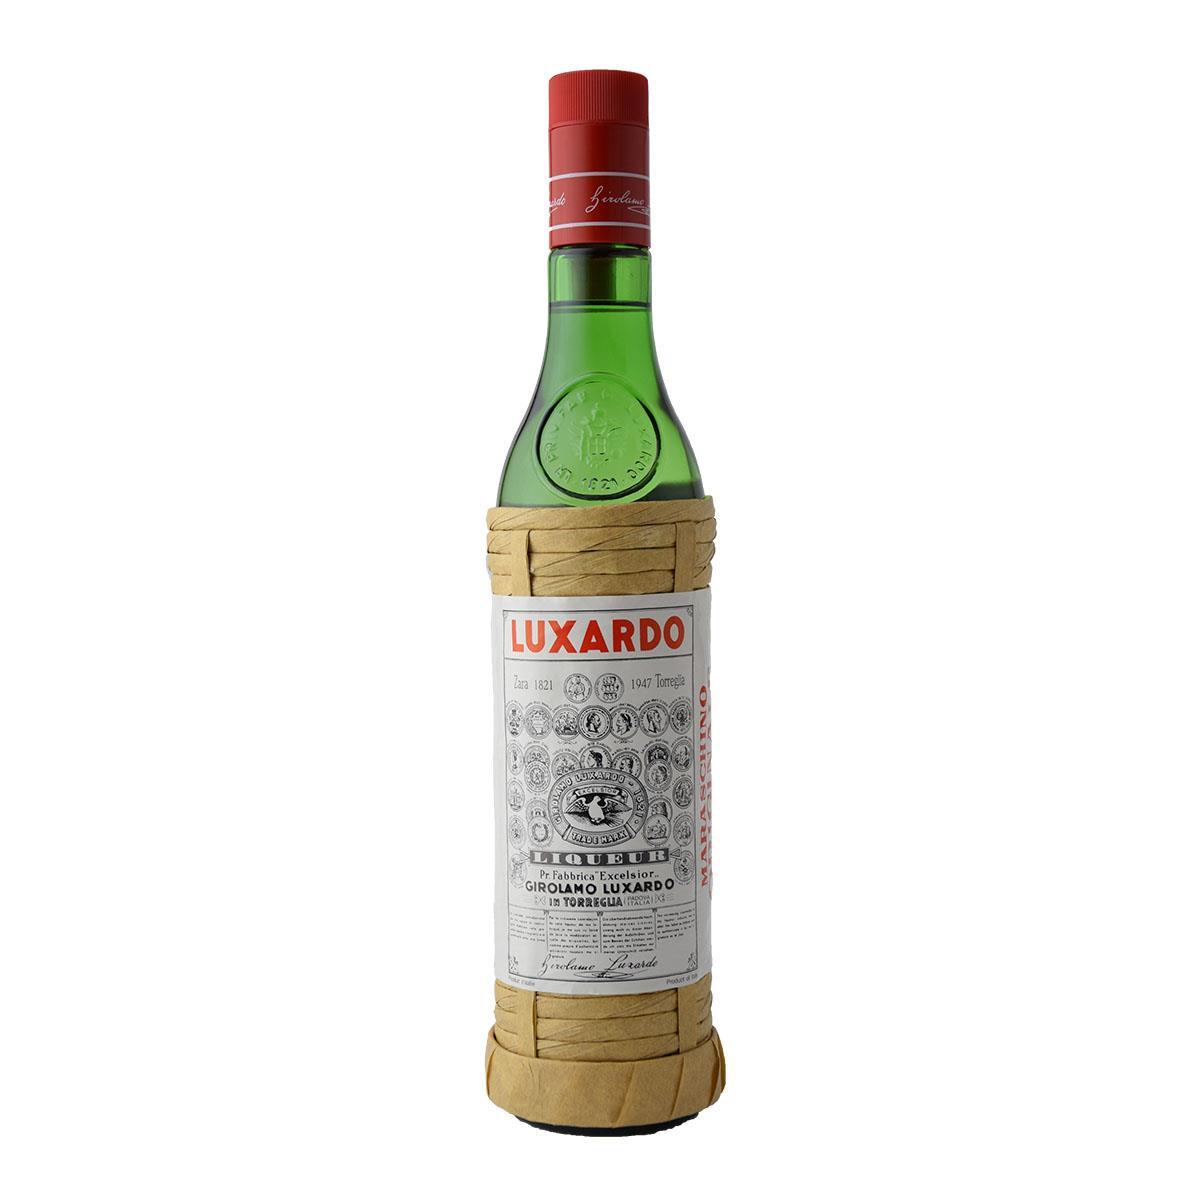 Luxardo Maraschino Liqueur 700ml